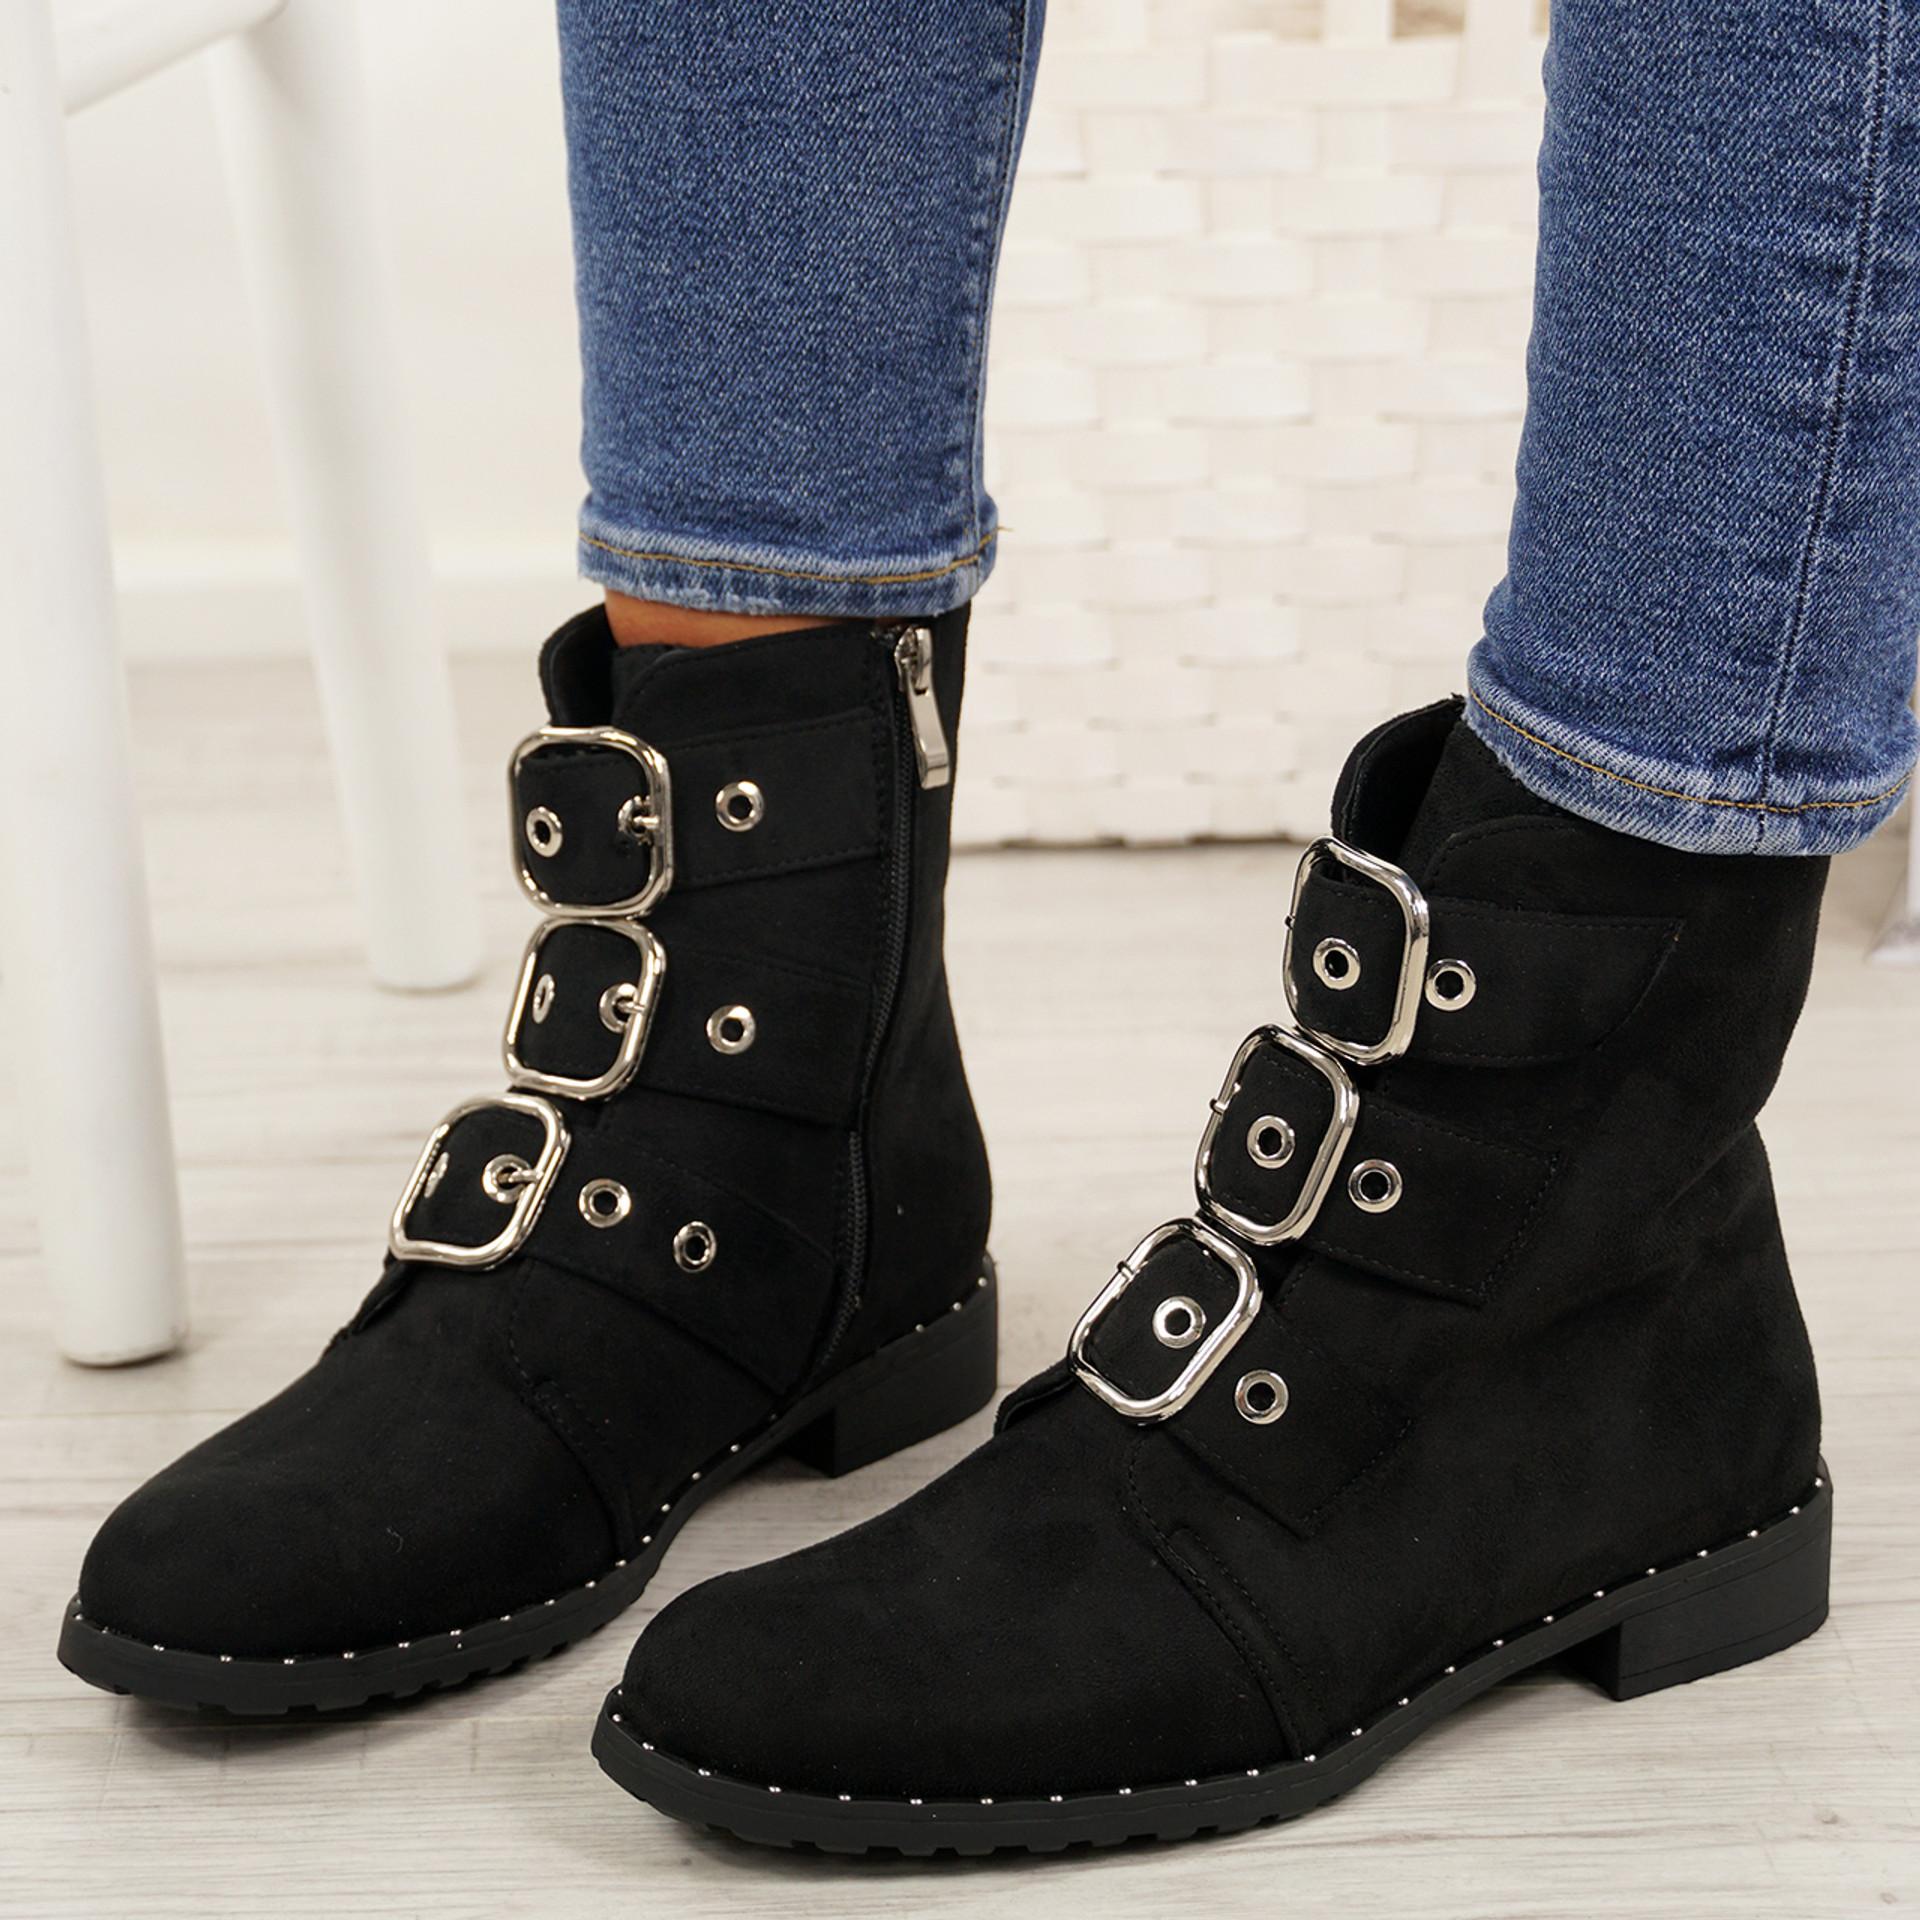 Leyga Black Suede Biker Ankle Boots